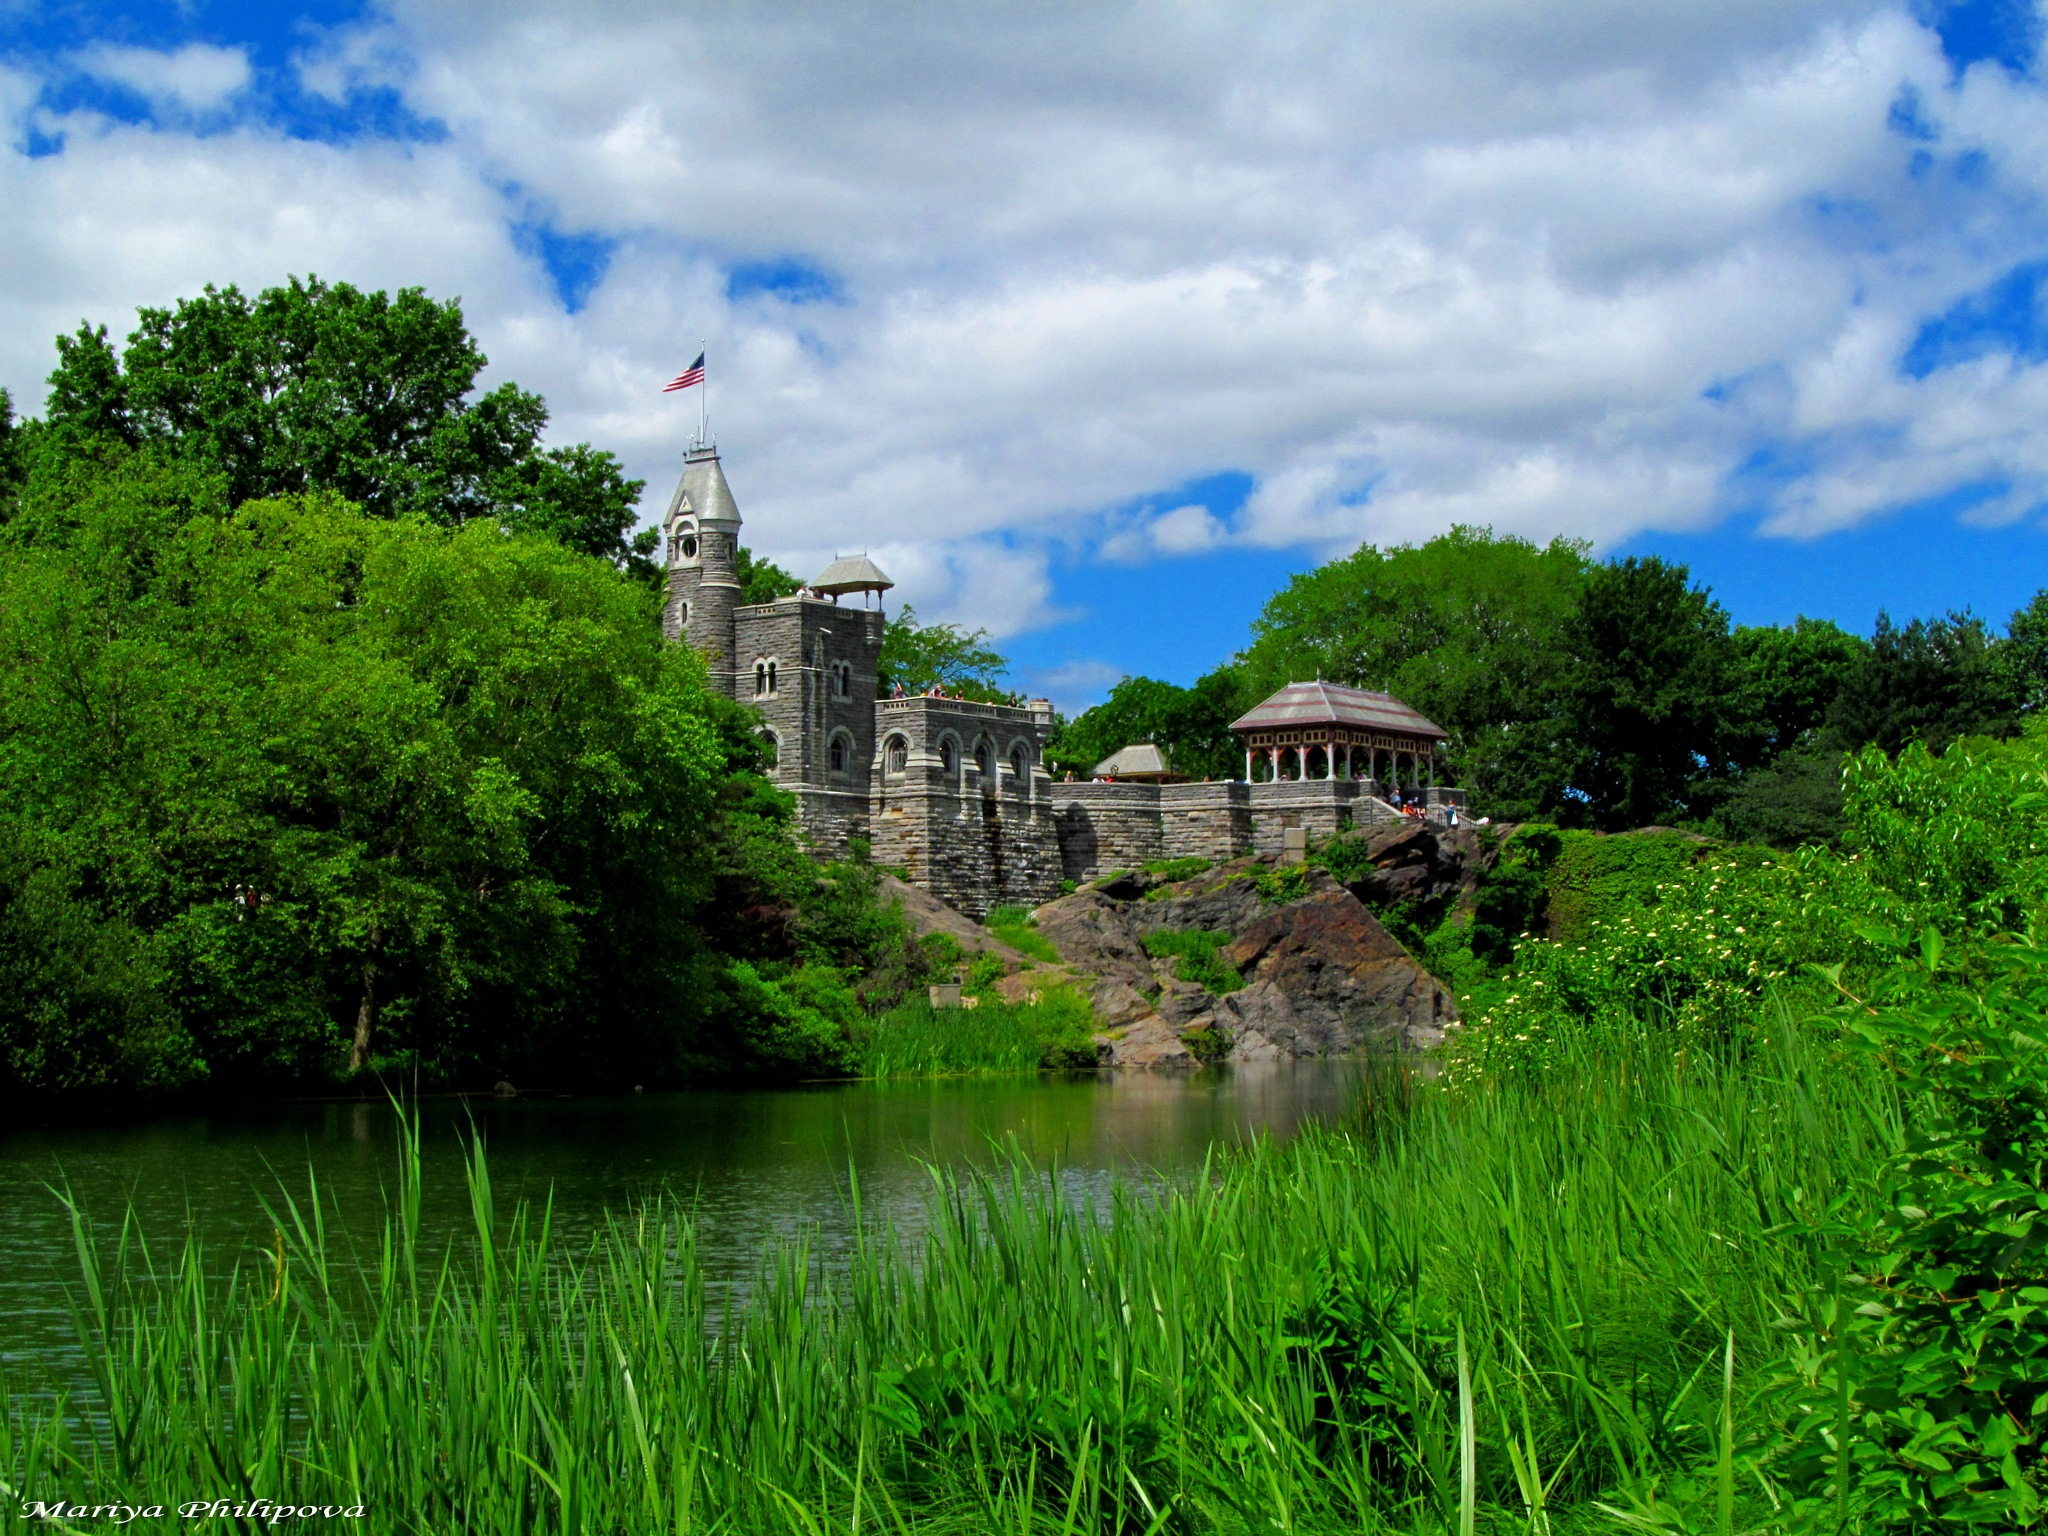 Belvedere Castle, Central Park, built 1869  by MariyaPhilipova